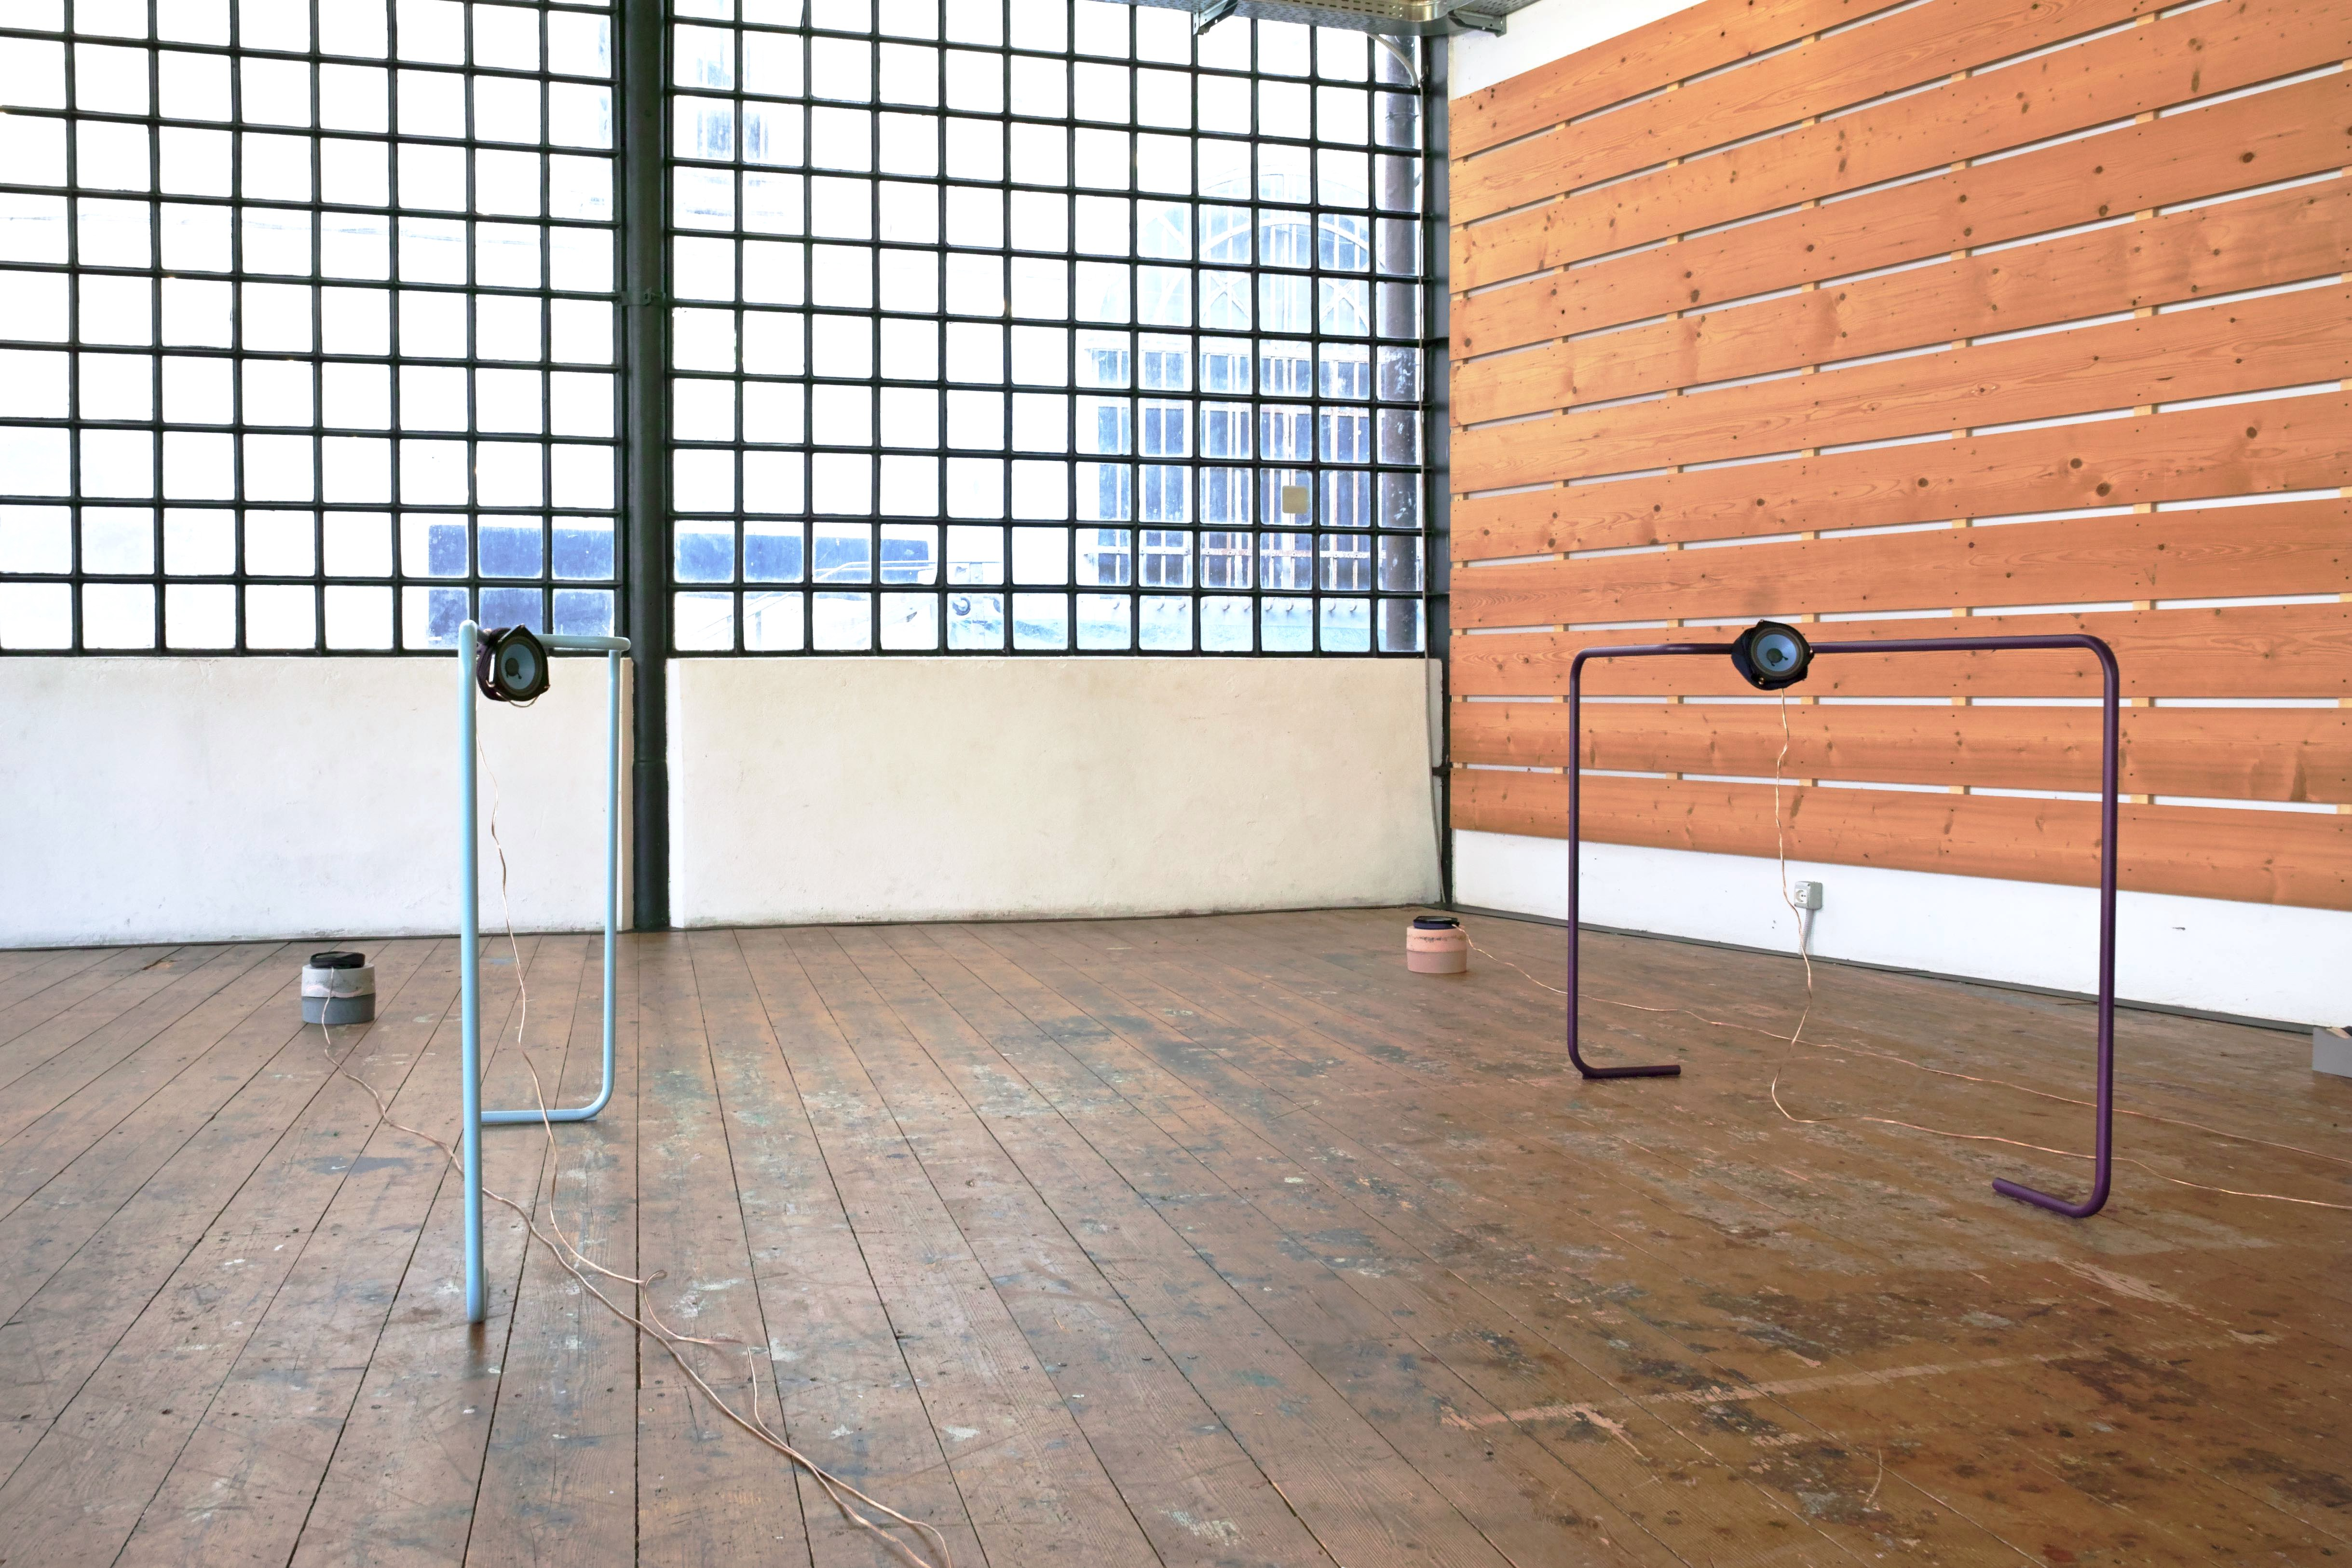 speakers, powder-coated bent metal structures, copper audio cables, Jesmonite sculptures, Lycra, Polyester fabric